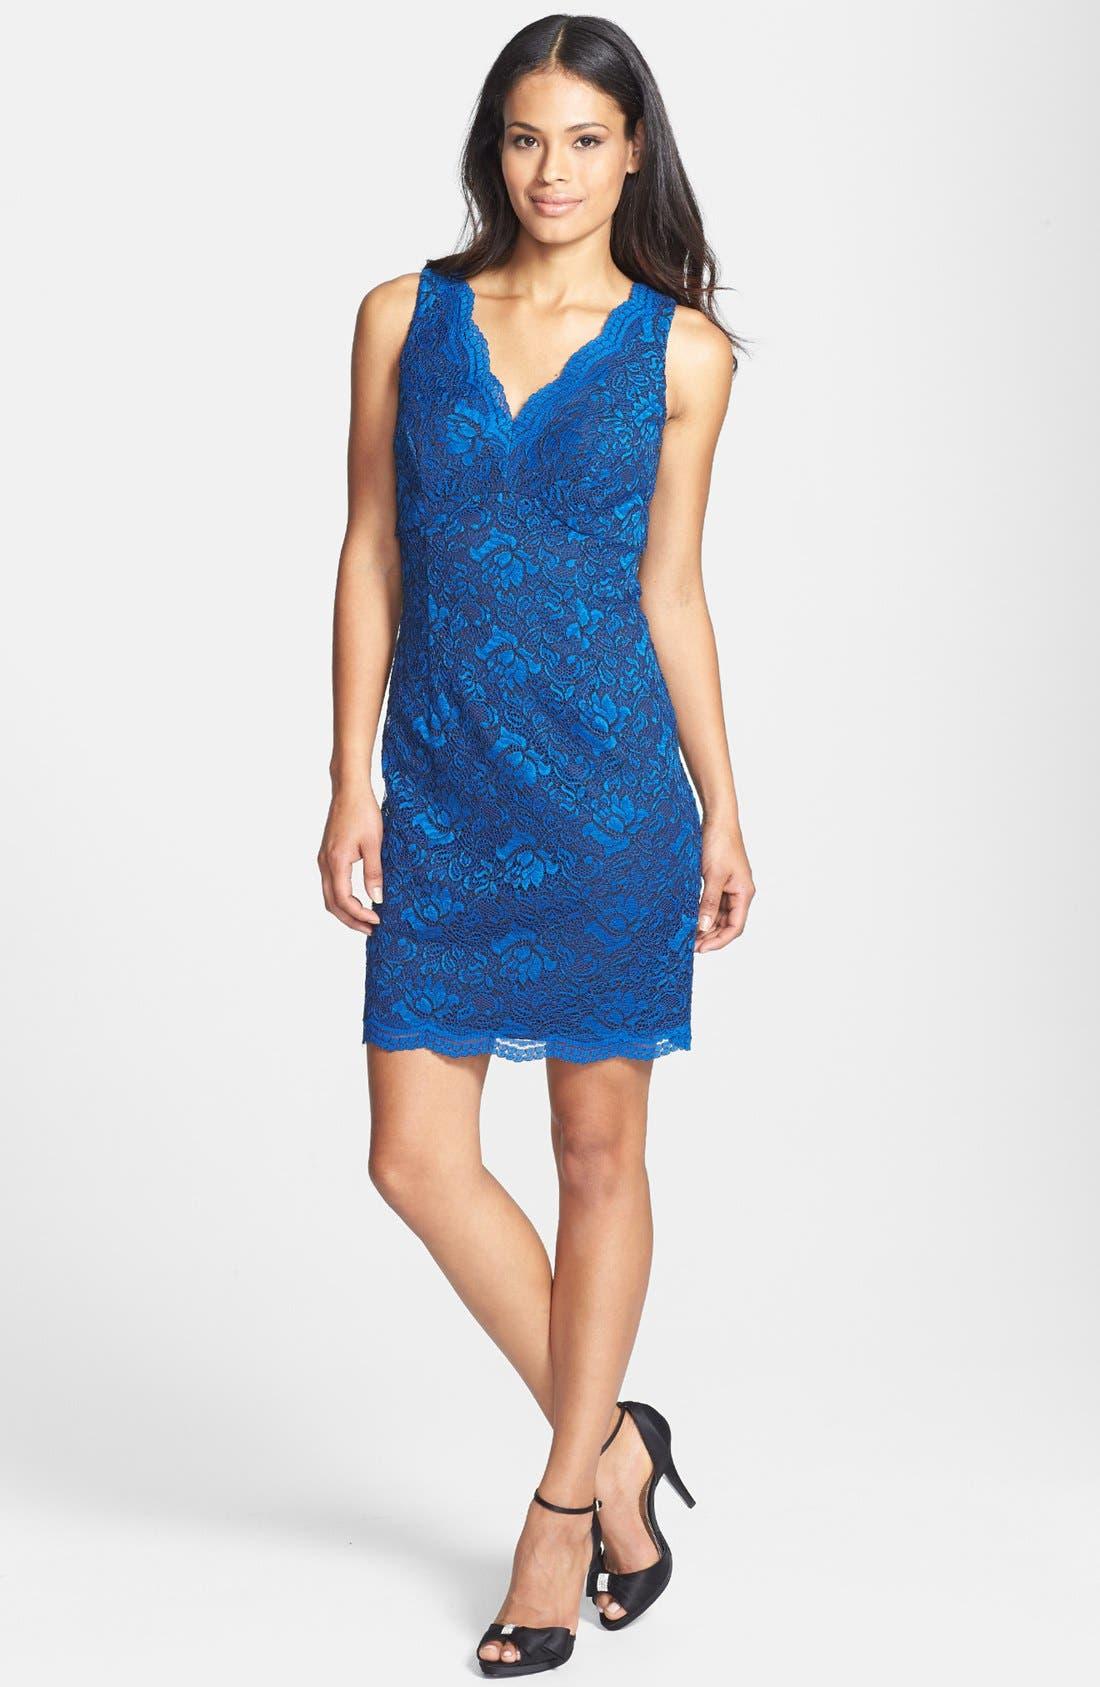 Alternate Image 1 Selected - Donna Ricco Scalloped Lace Sheath Dress (Petite)